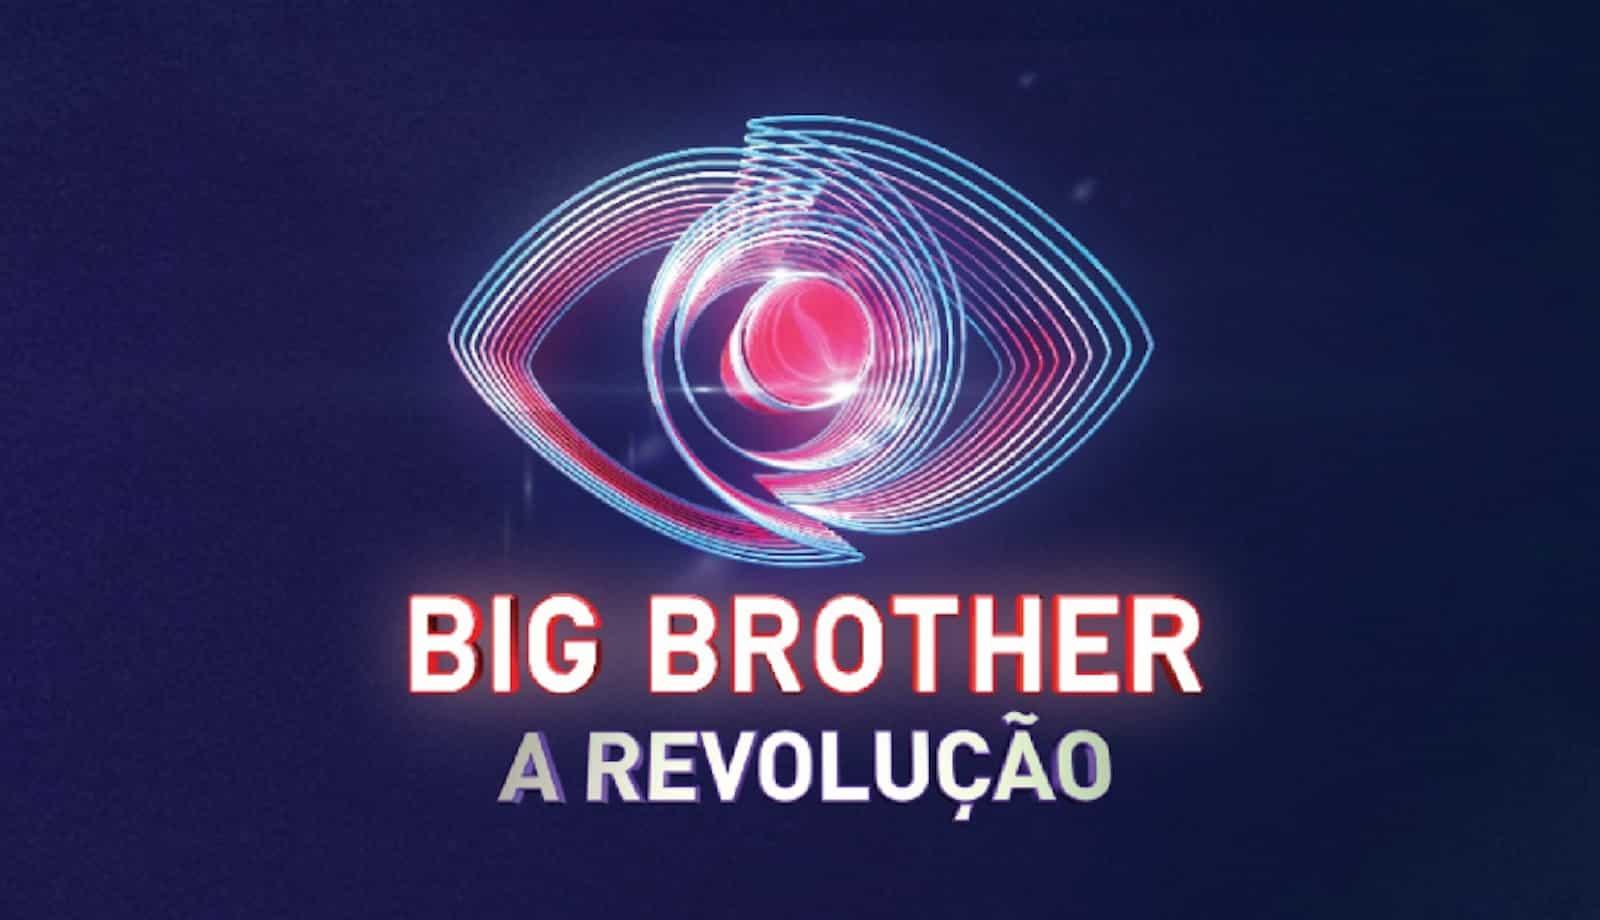 Big Brother A Revolucao